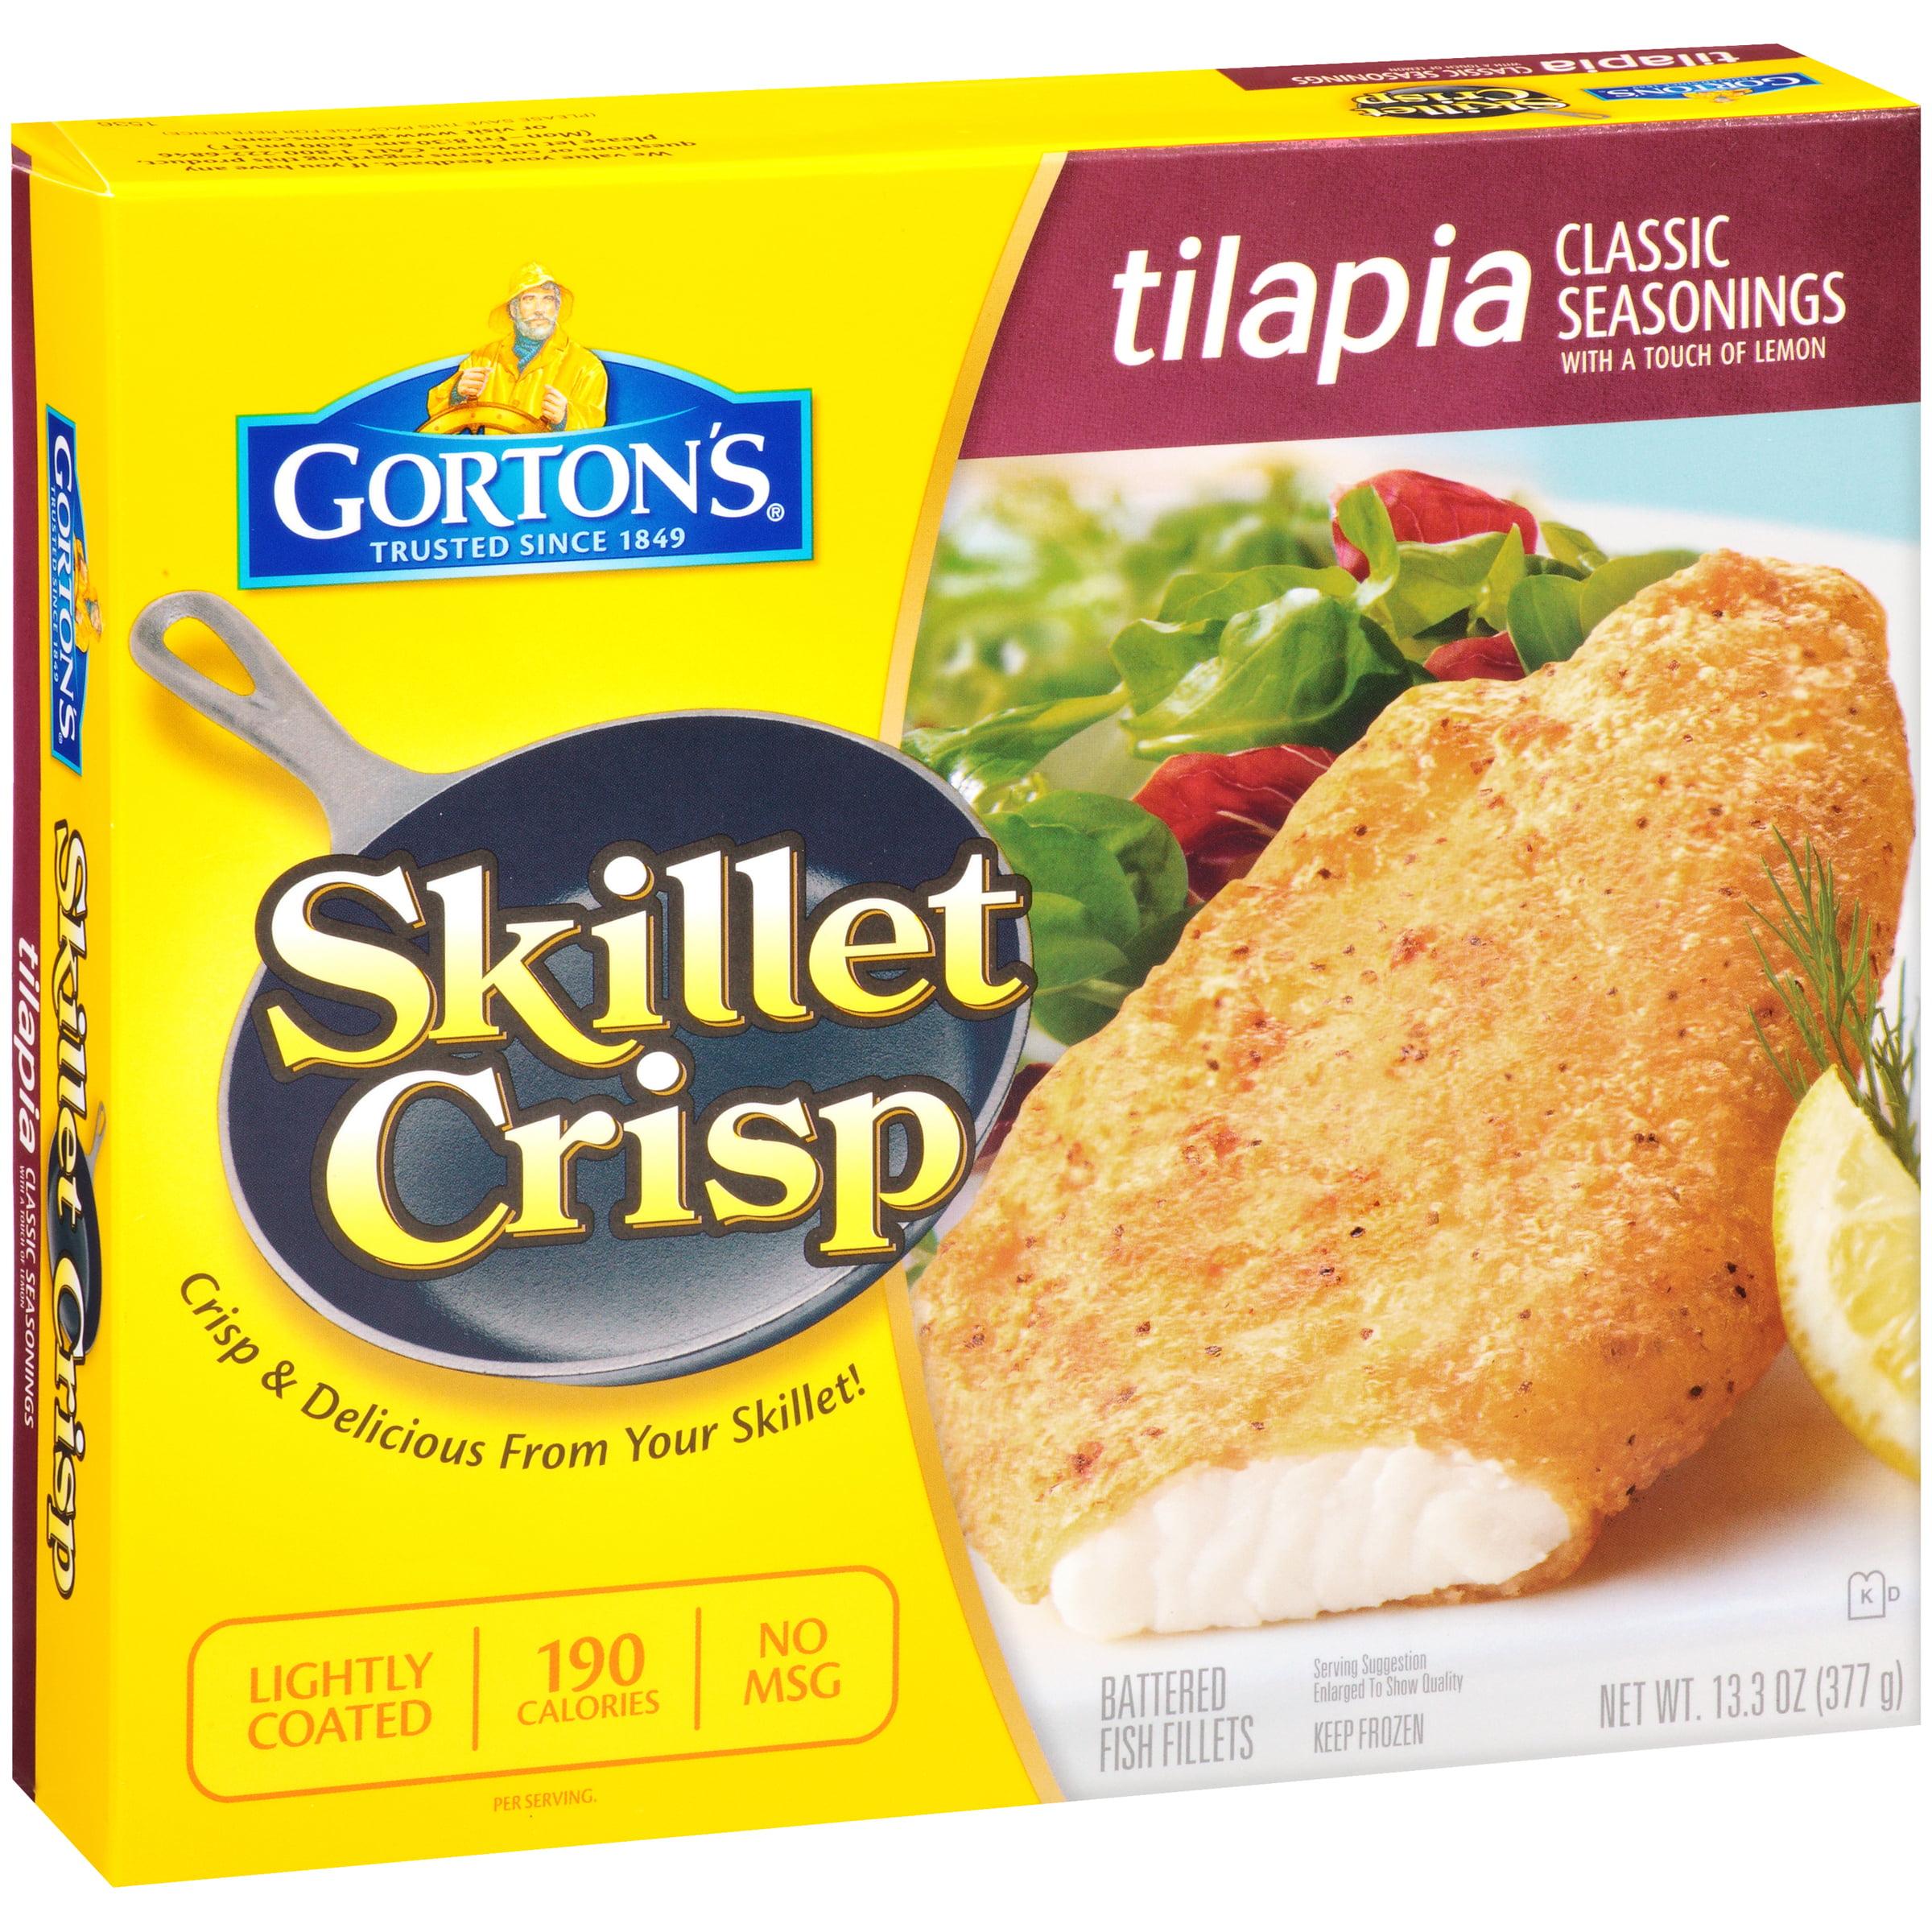 Gorton's® Skillet Crisp Classic Seasonings Tilapia 13.3 oz. Box